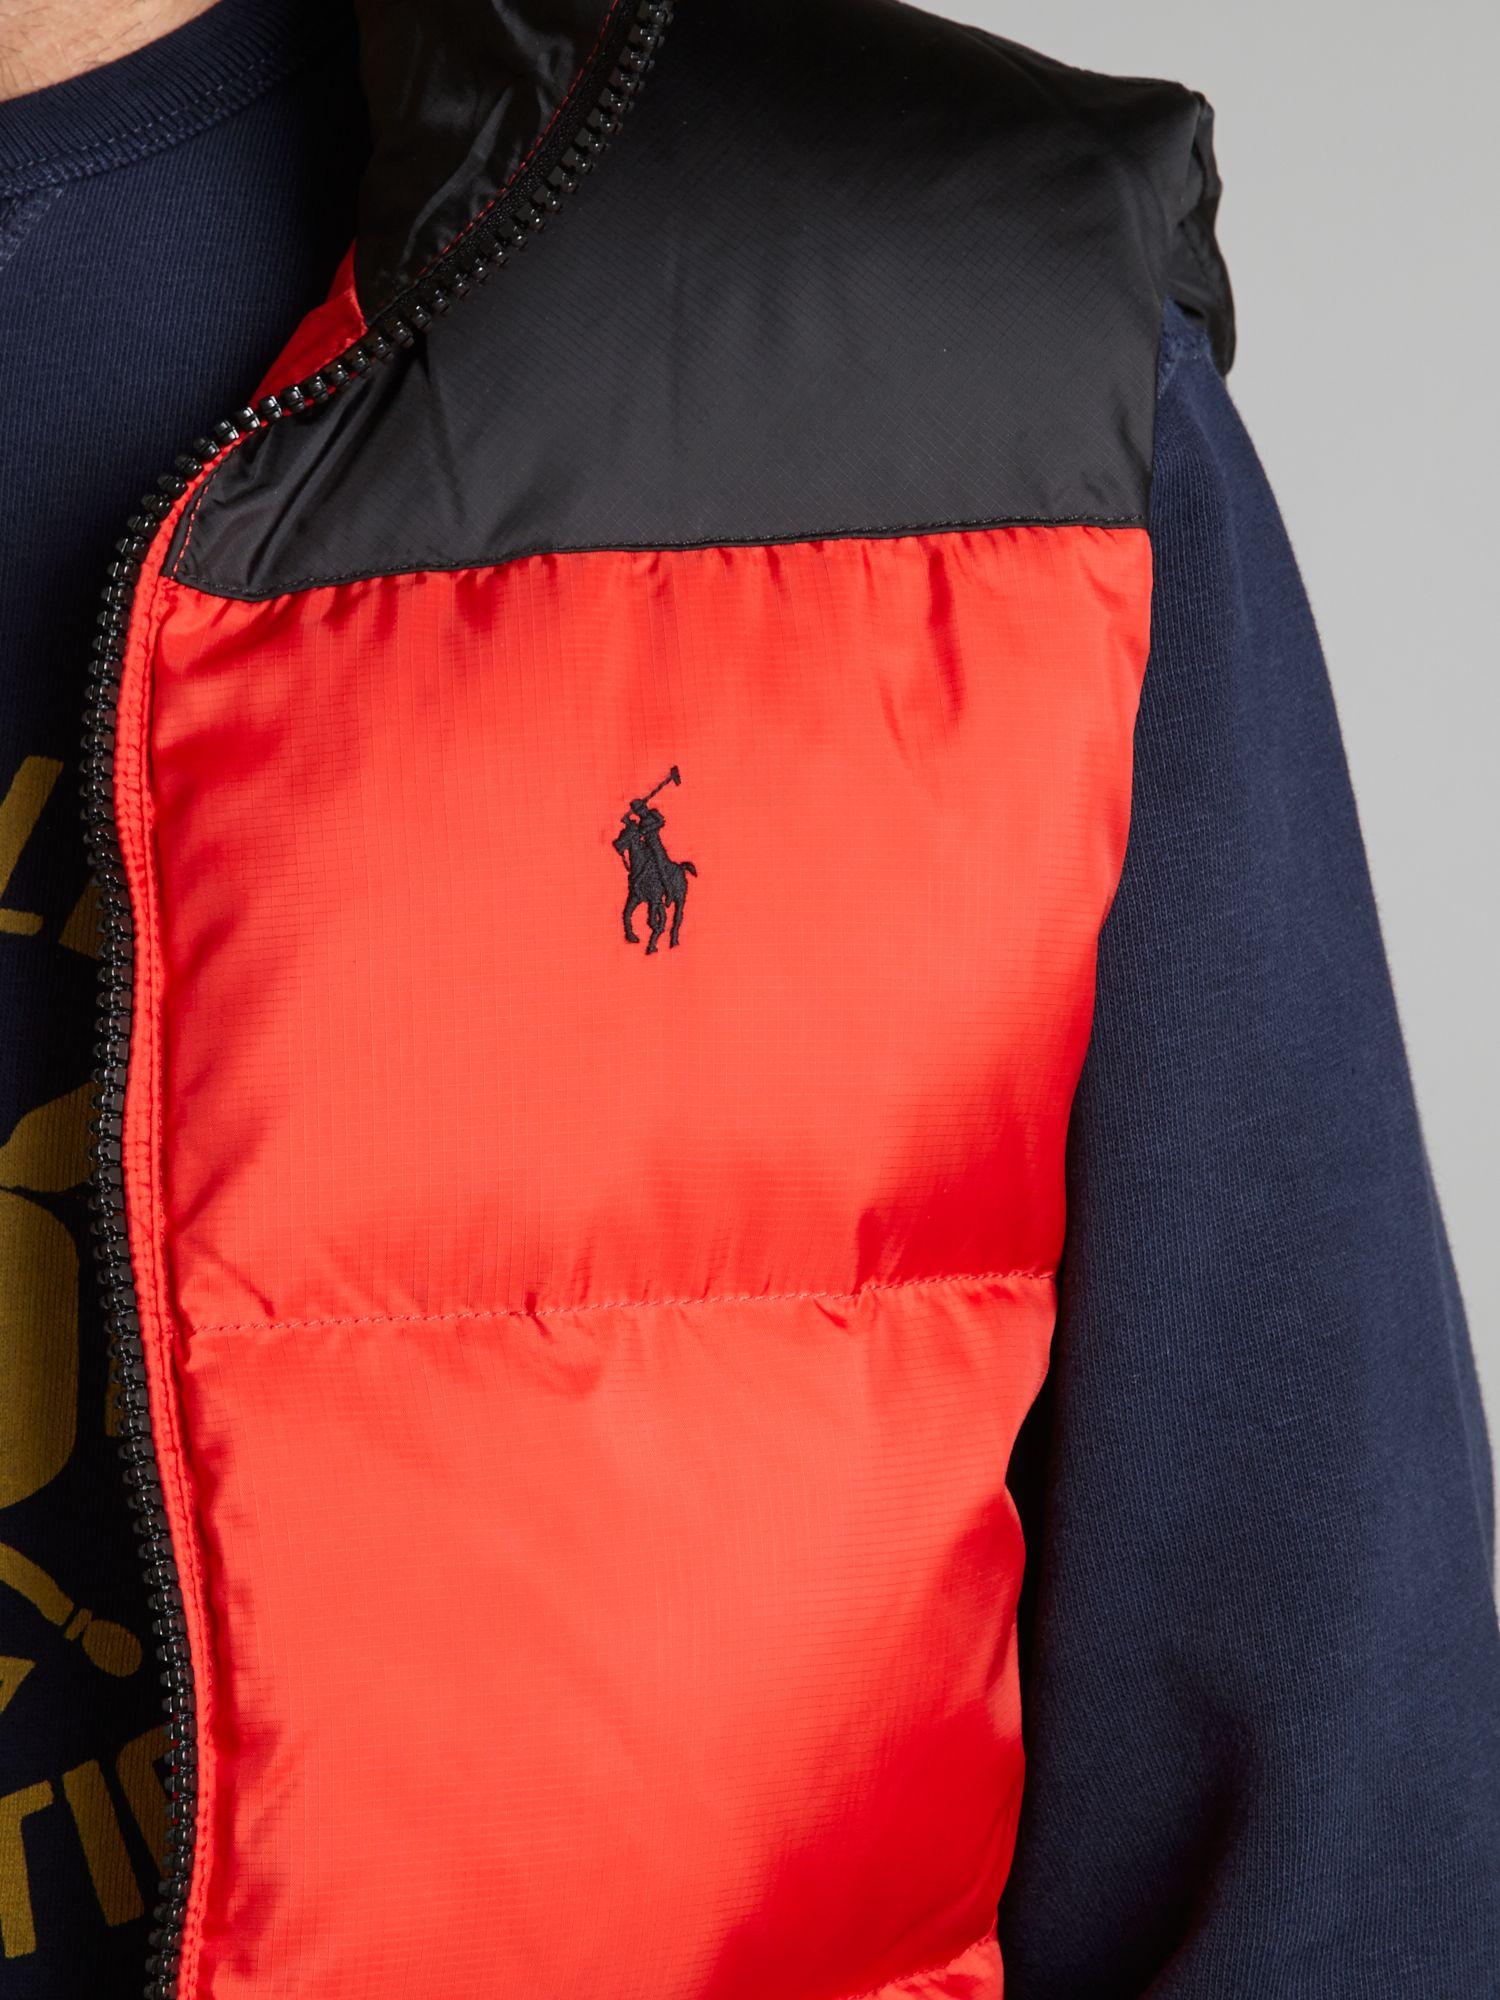 polo ralph lauren core trek padded gilet in red for men lyst. Black Bedroom Furniture Sets. Home Design Ideas